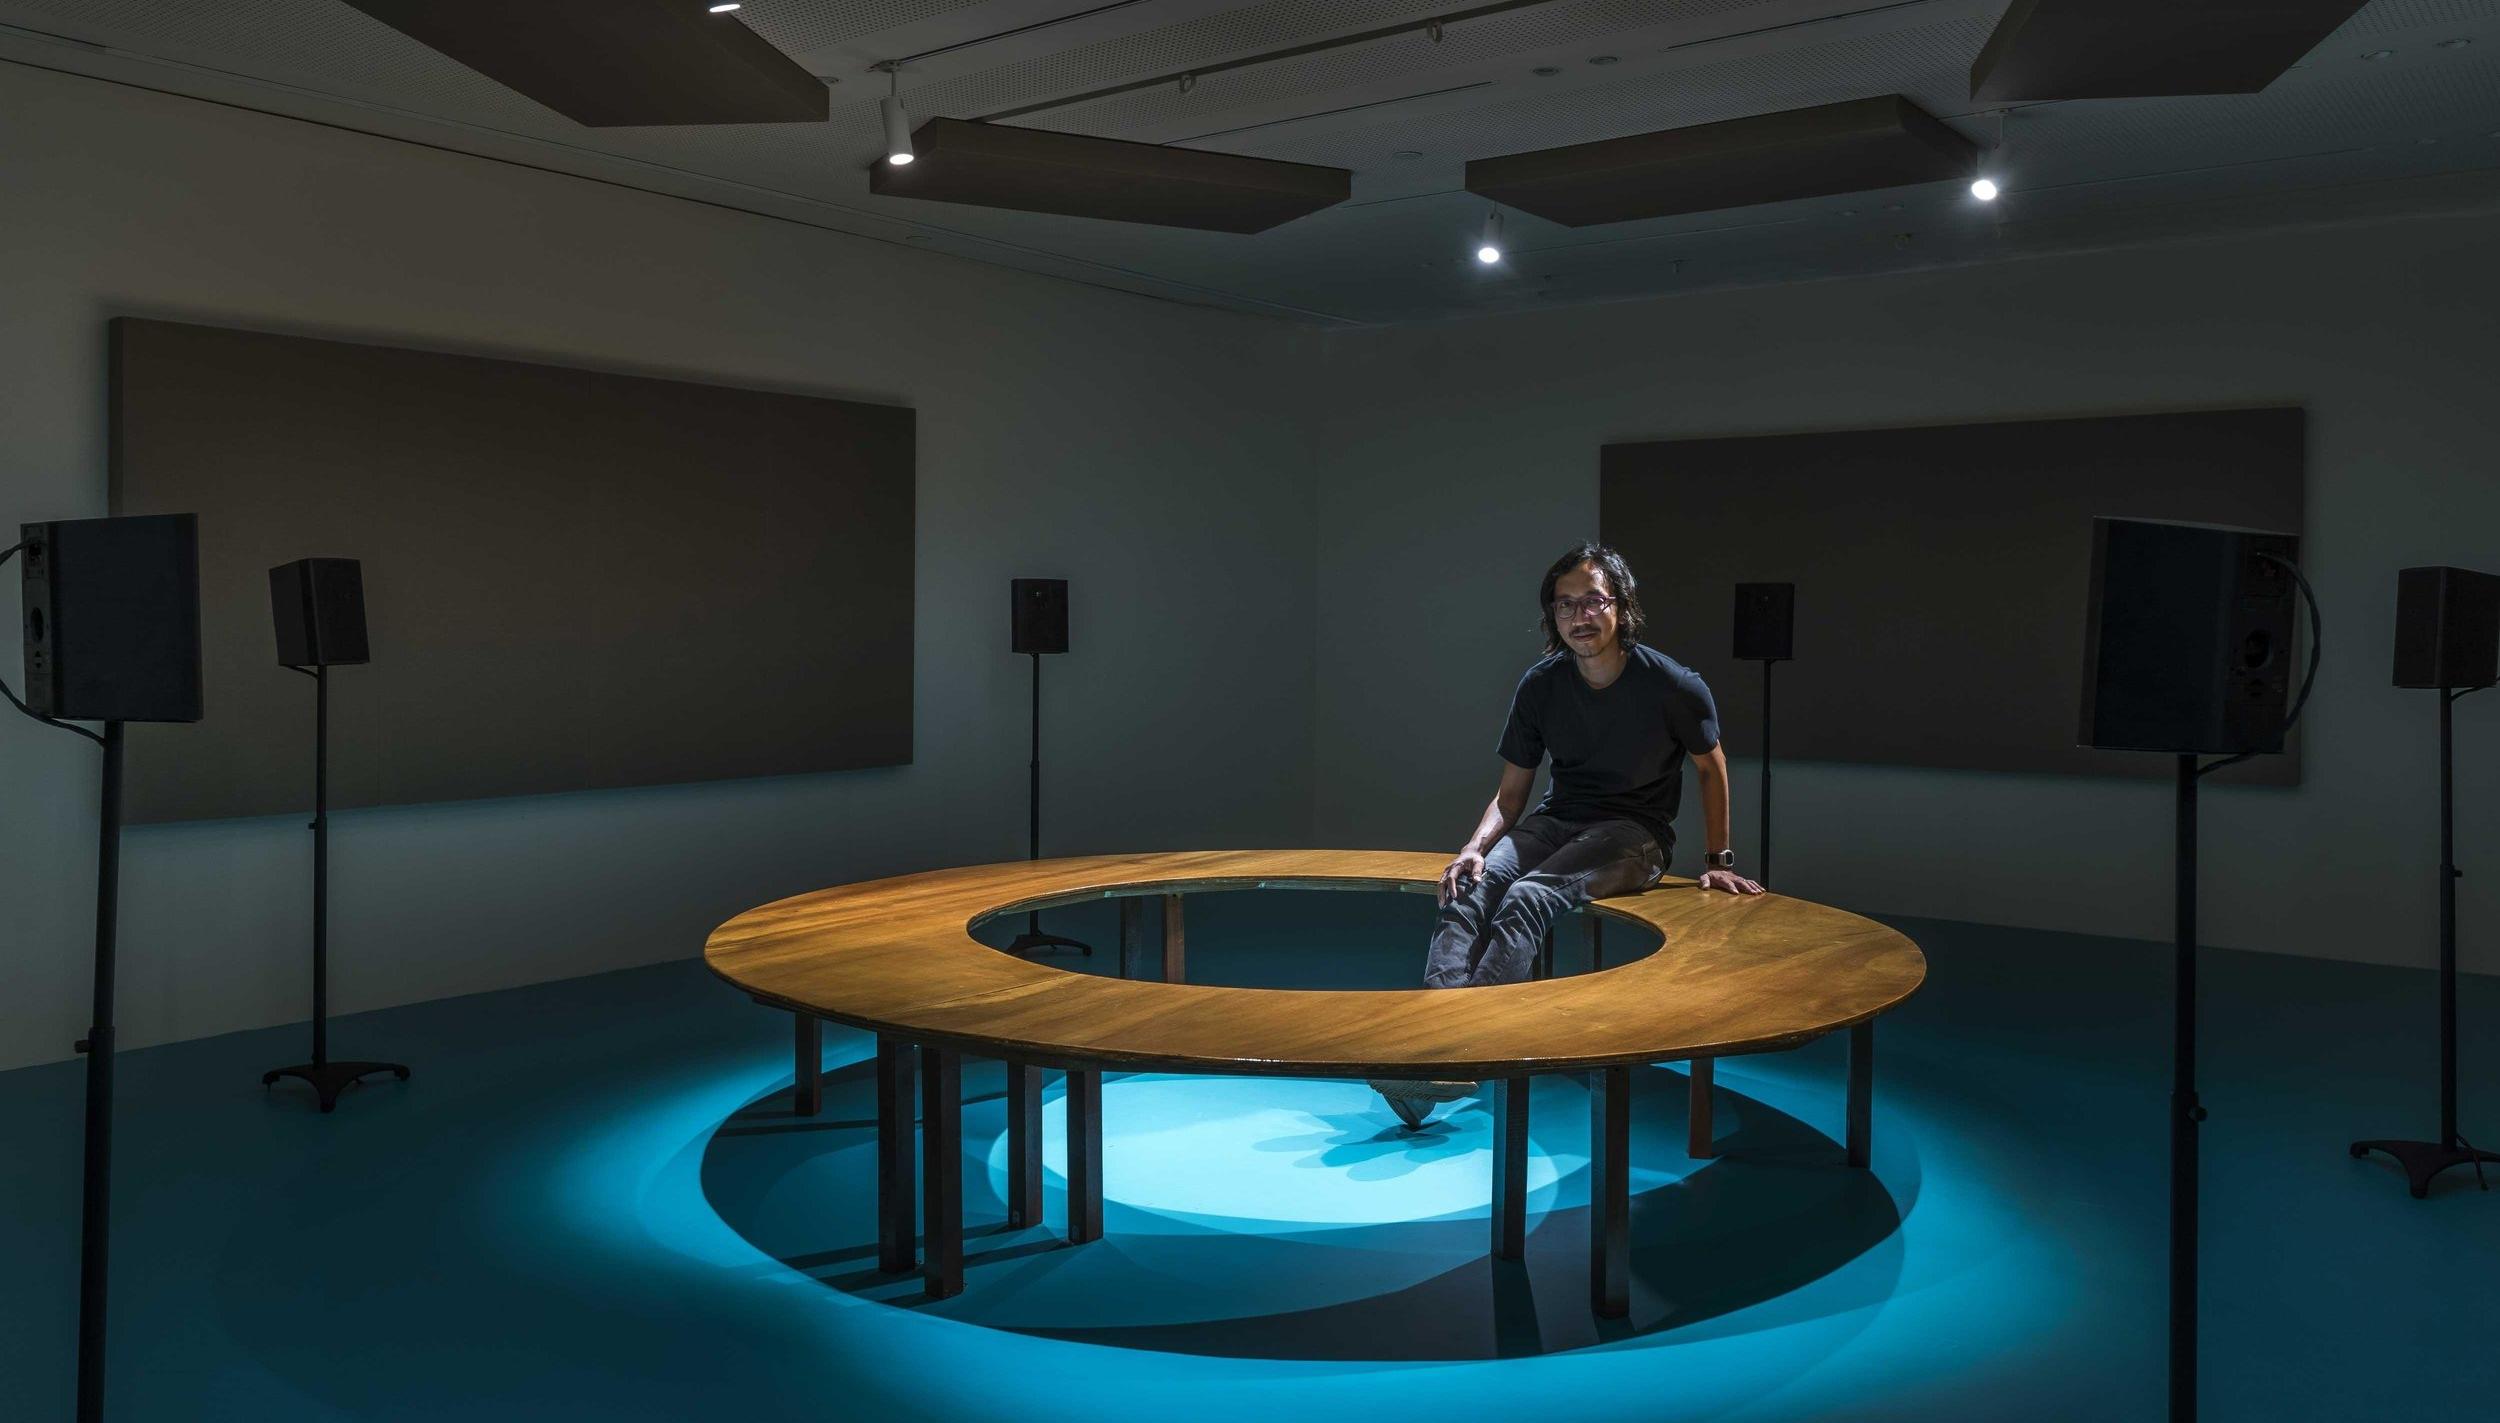 fidelity , Jeremy Sharma 2018, Installation View at Aloft at Hermès  Photography by Edward Hendricks